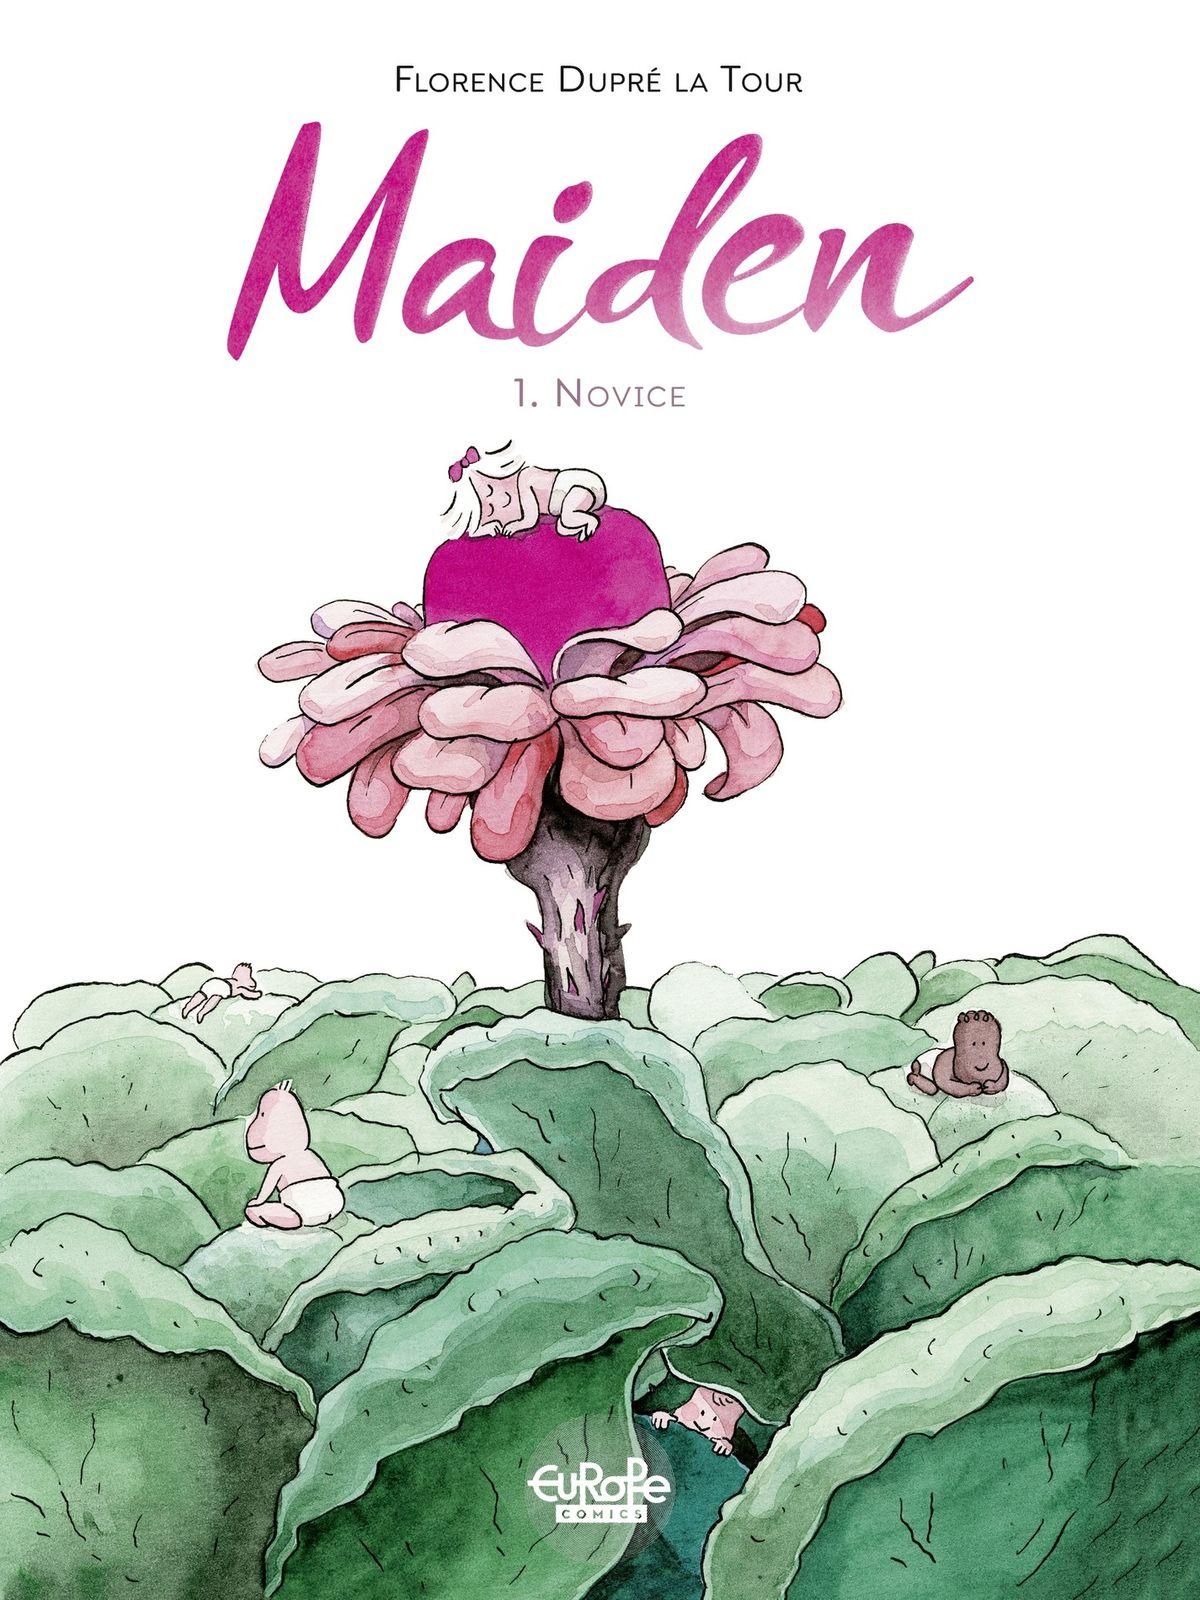 Maiden 1. Novice by Florence Dupre la Tour